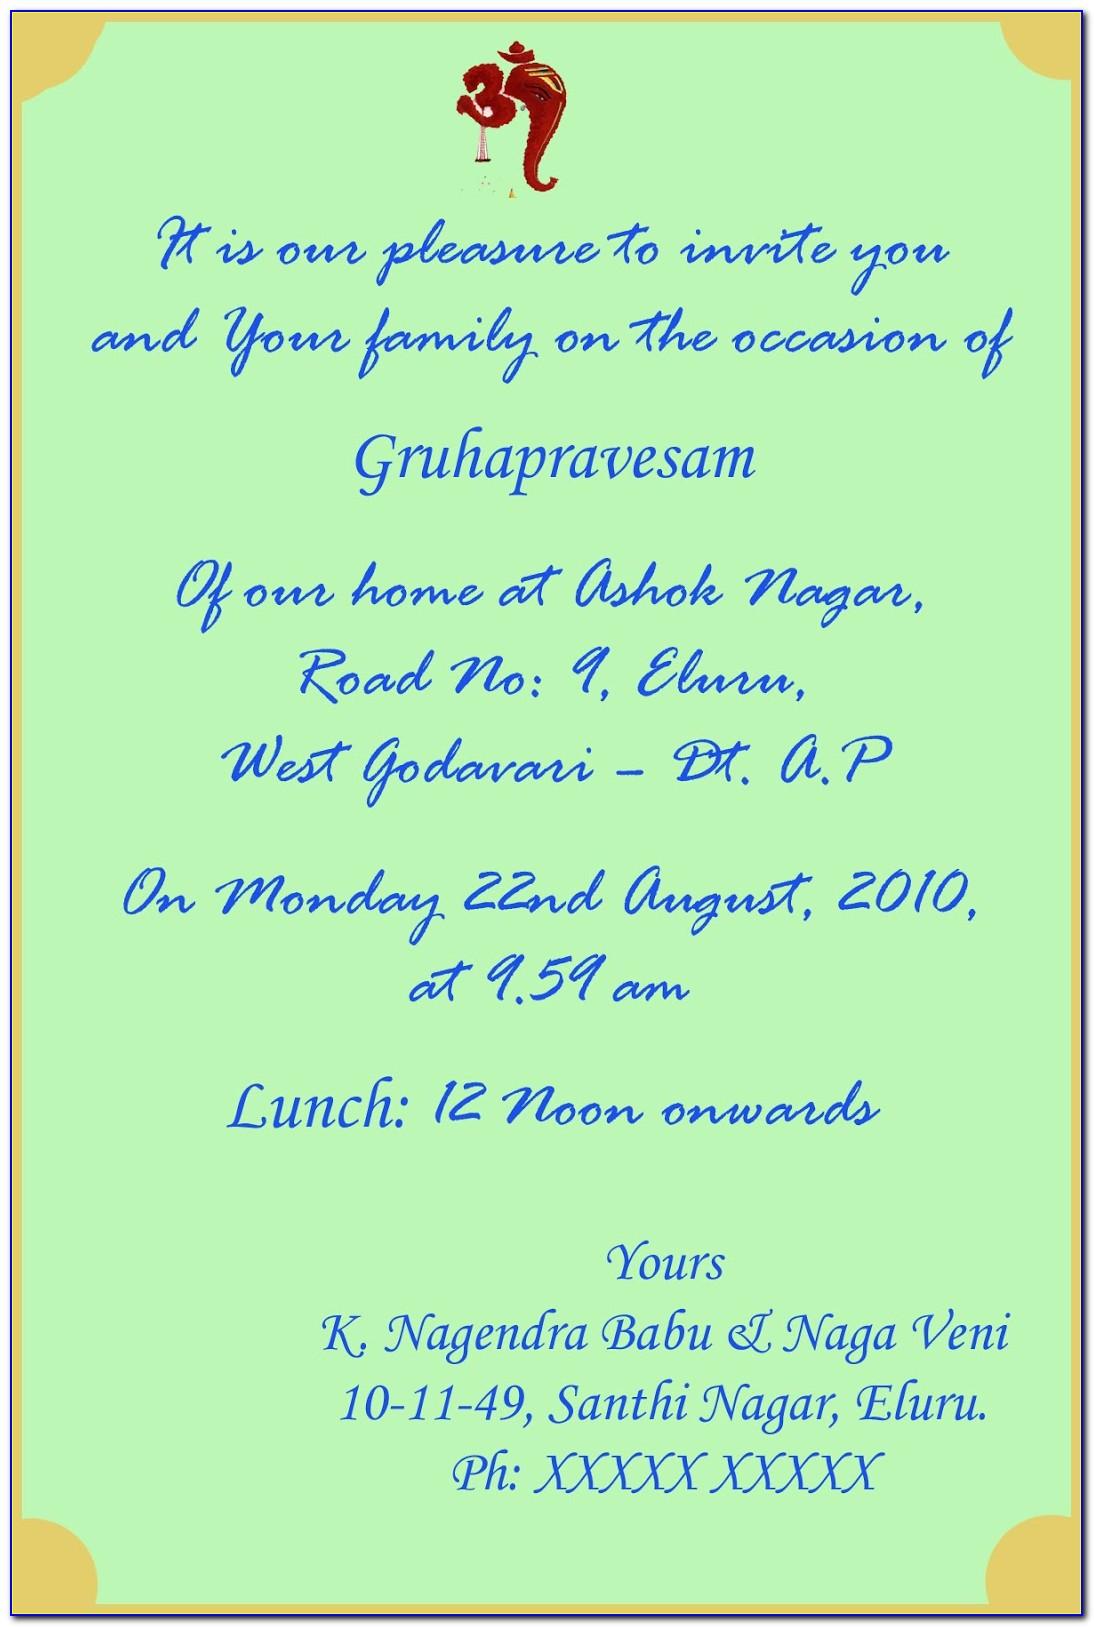 Gruhapravesam Invitation Template Vector